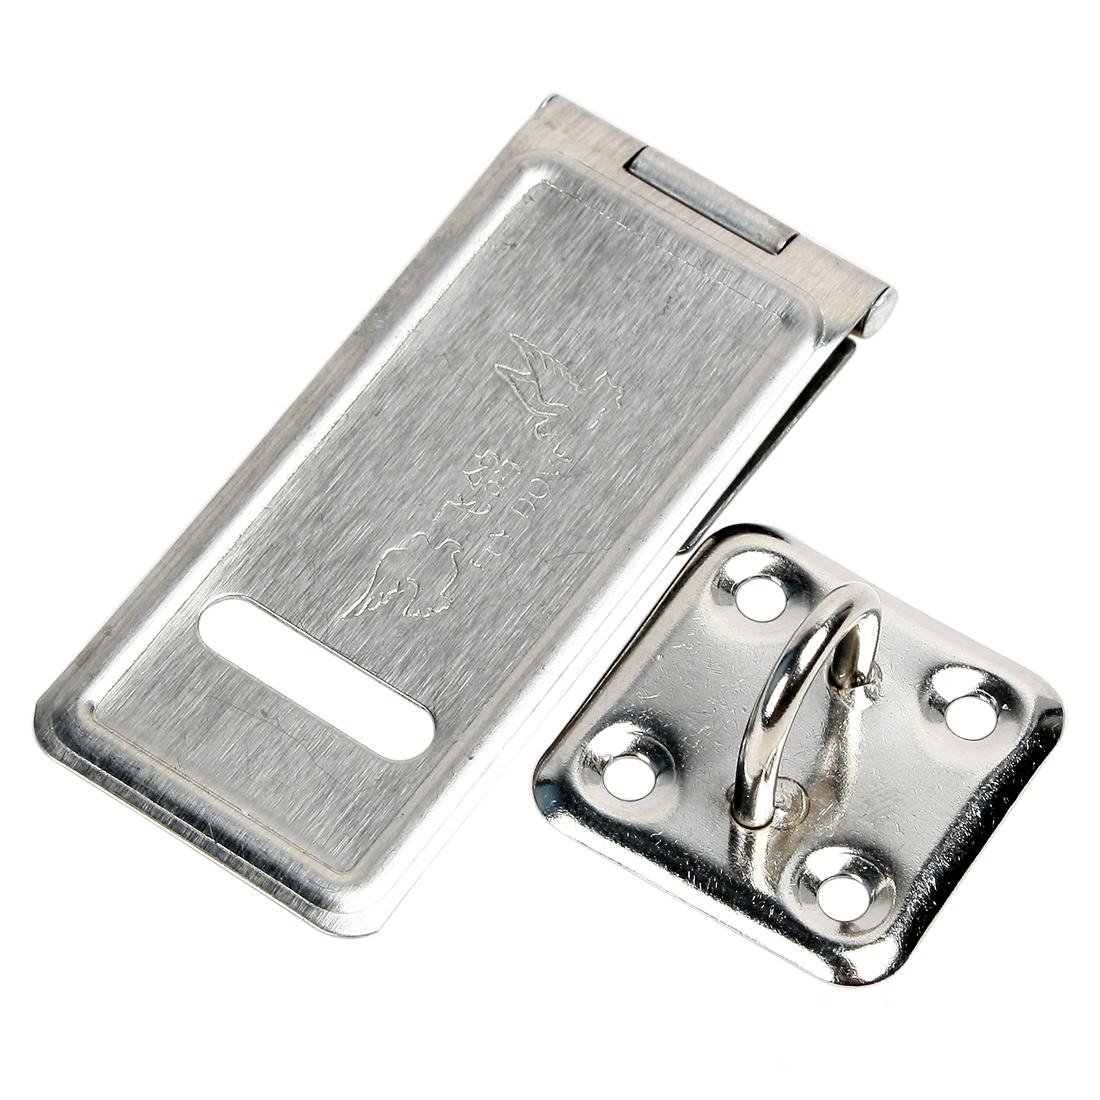 4pcs 70mm x 30mm Stainless Steel Door Lock Striker Latch Catch Bolt Hasp Staple